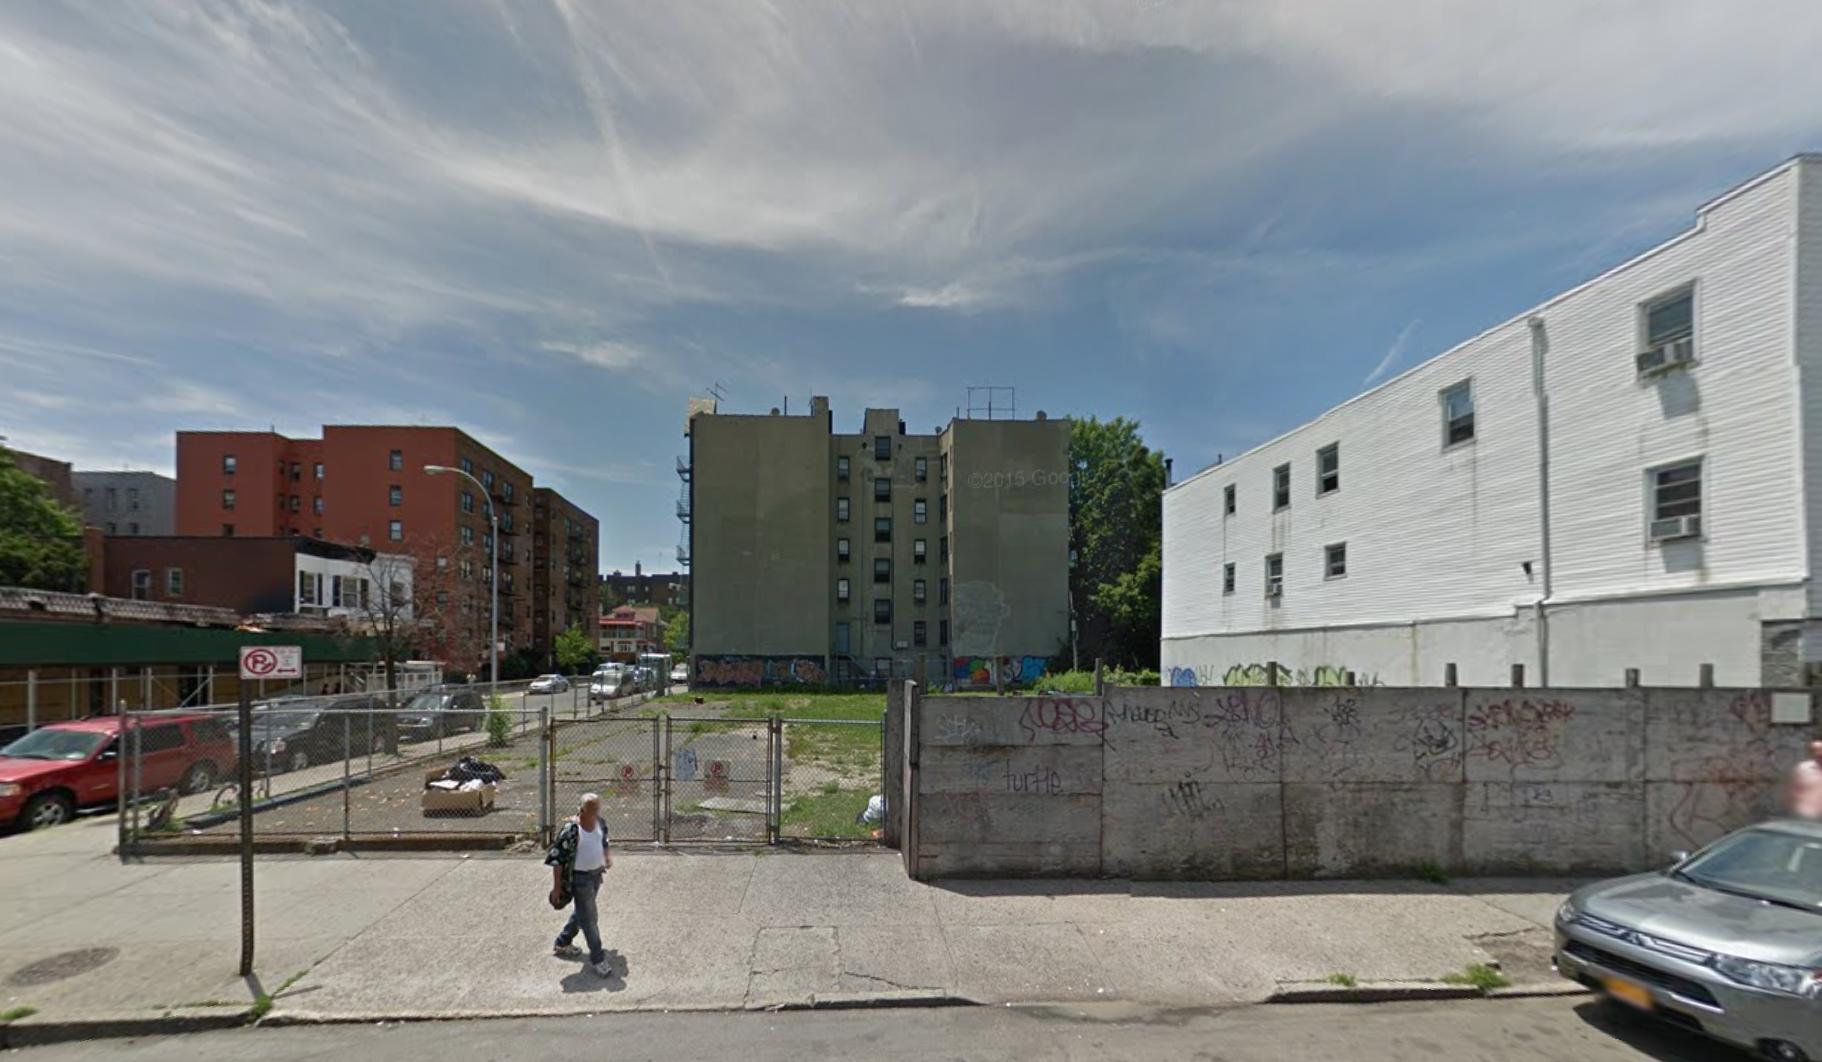 244 East 198th Street, image via Google Maps